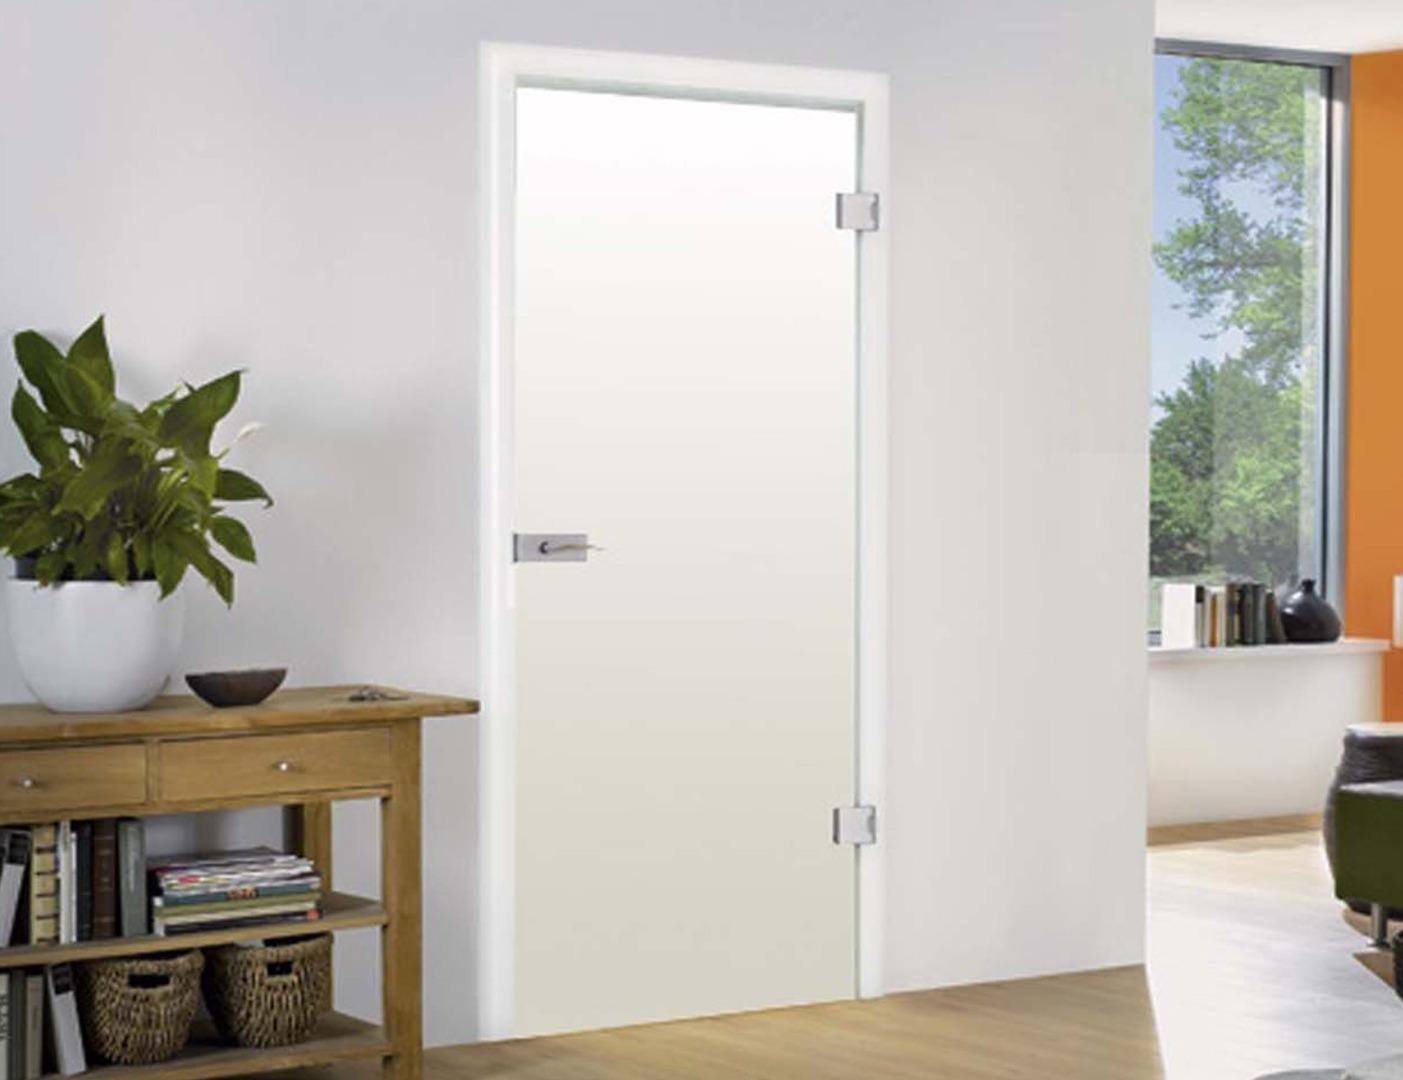 Fullsize Of Frosted Glass Door